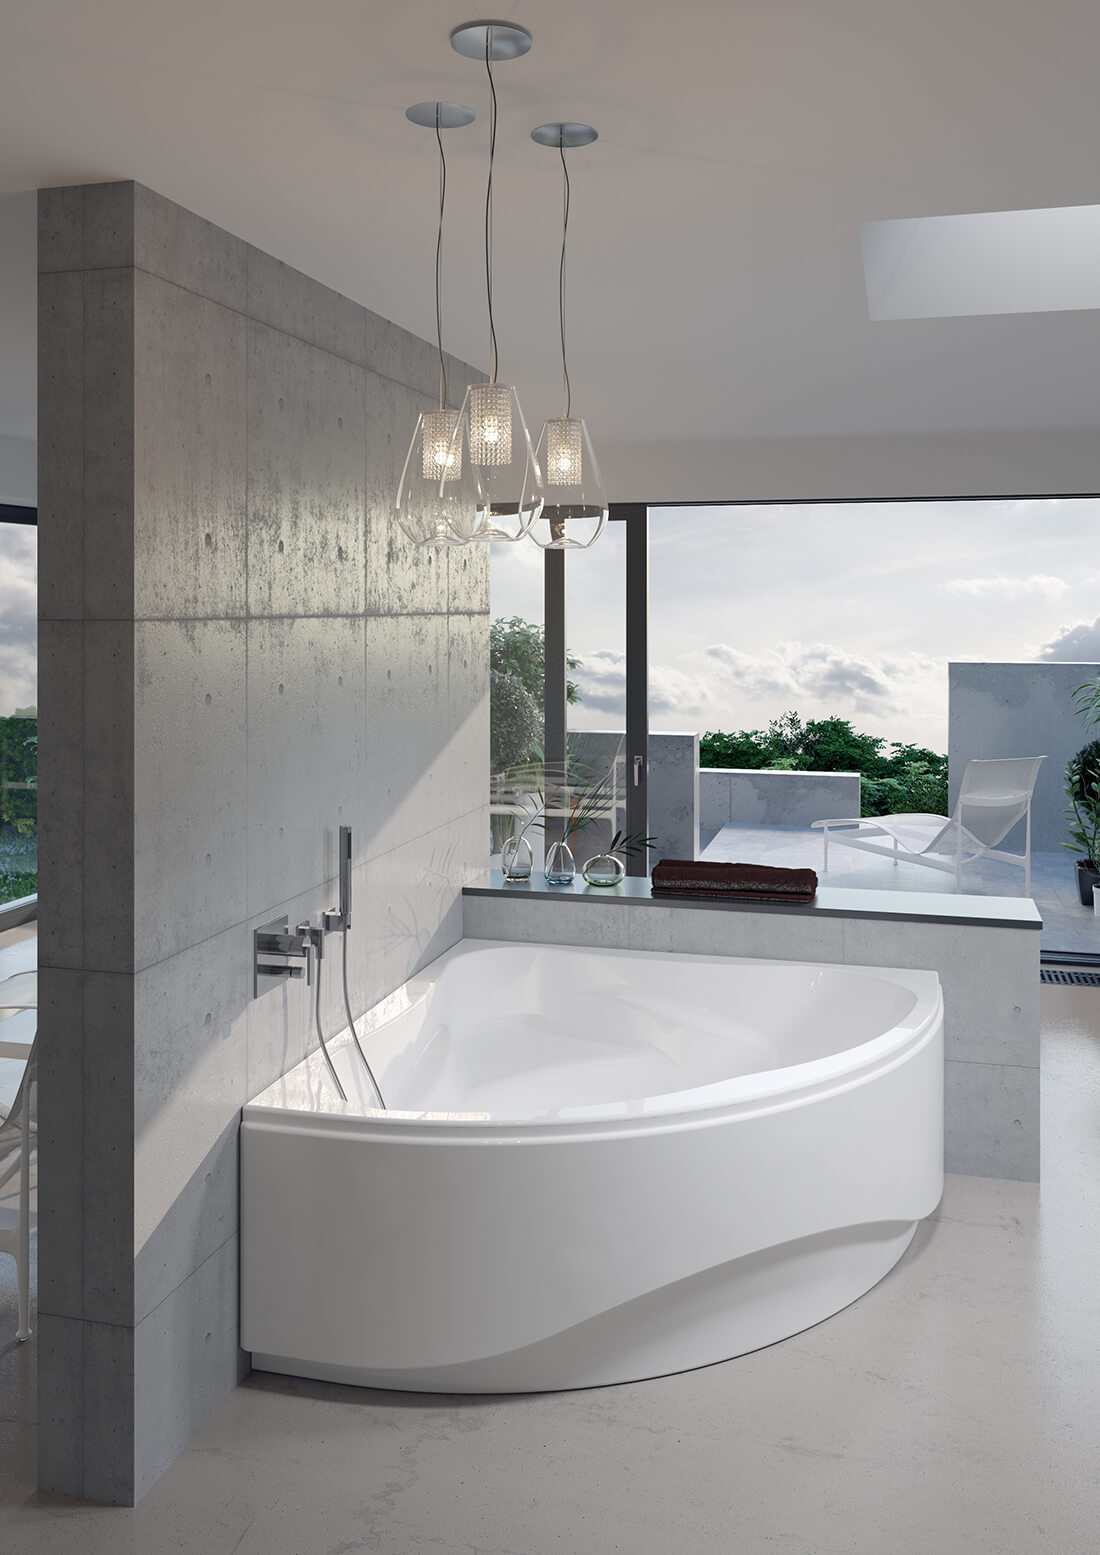 Baignoire dAngle Riho Neo - Quelle baignoire pour une grande salle de bains